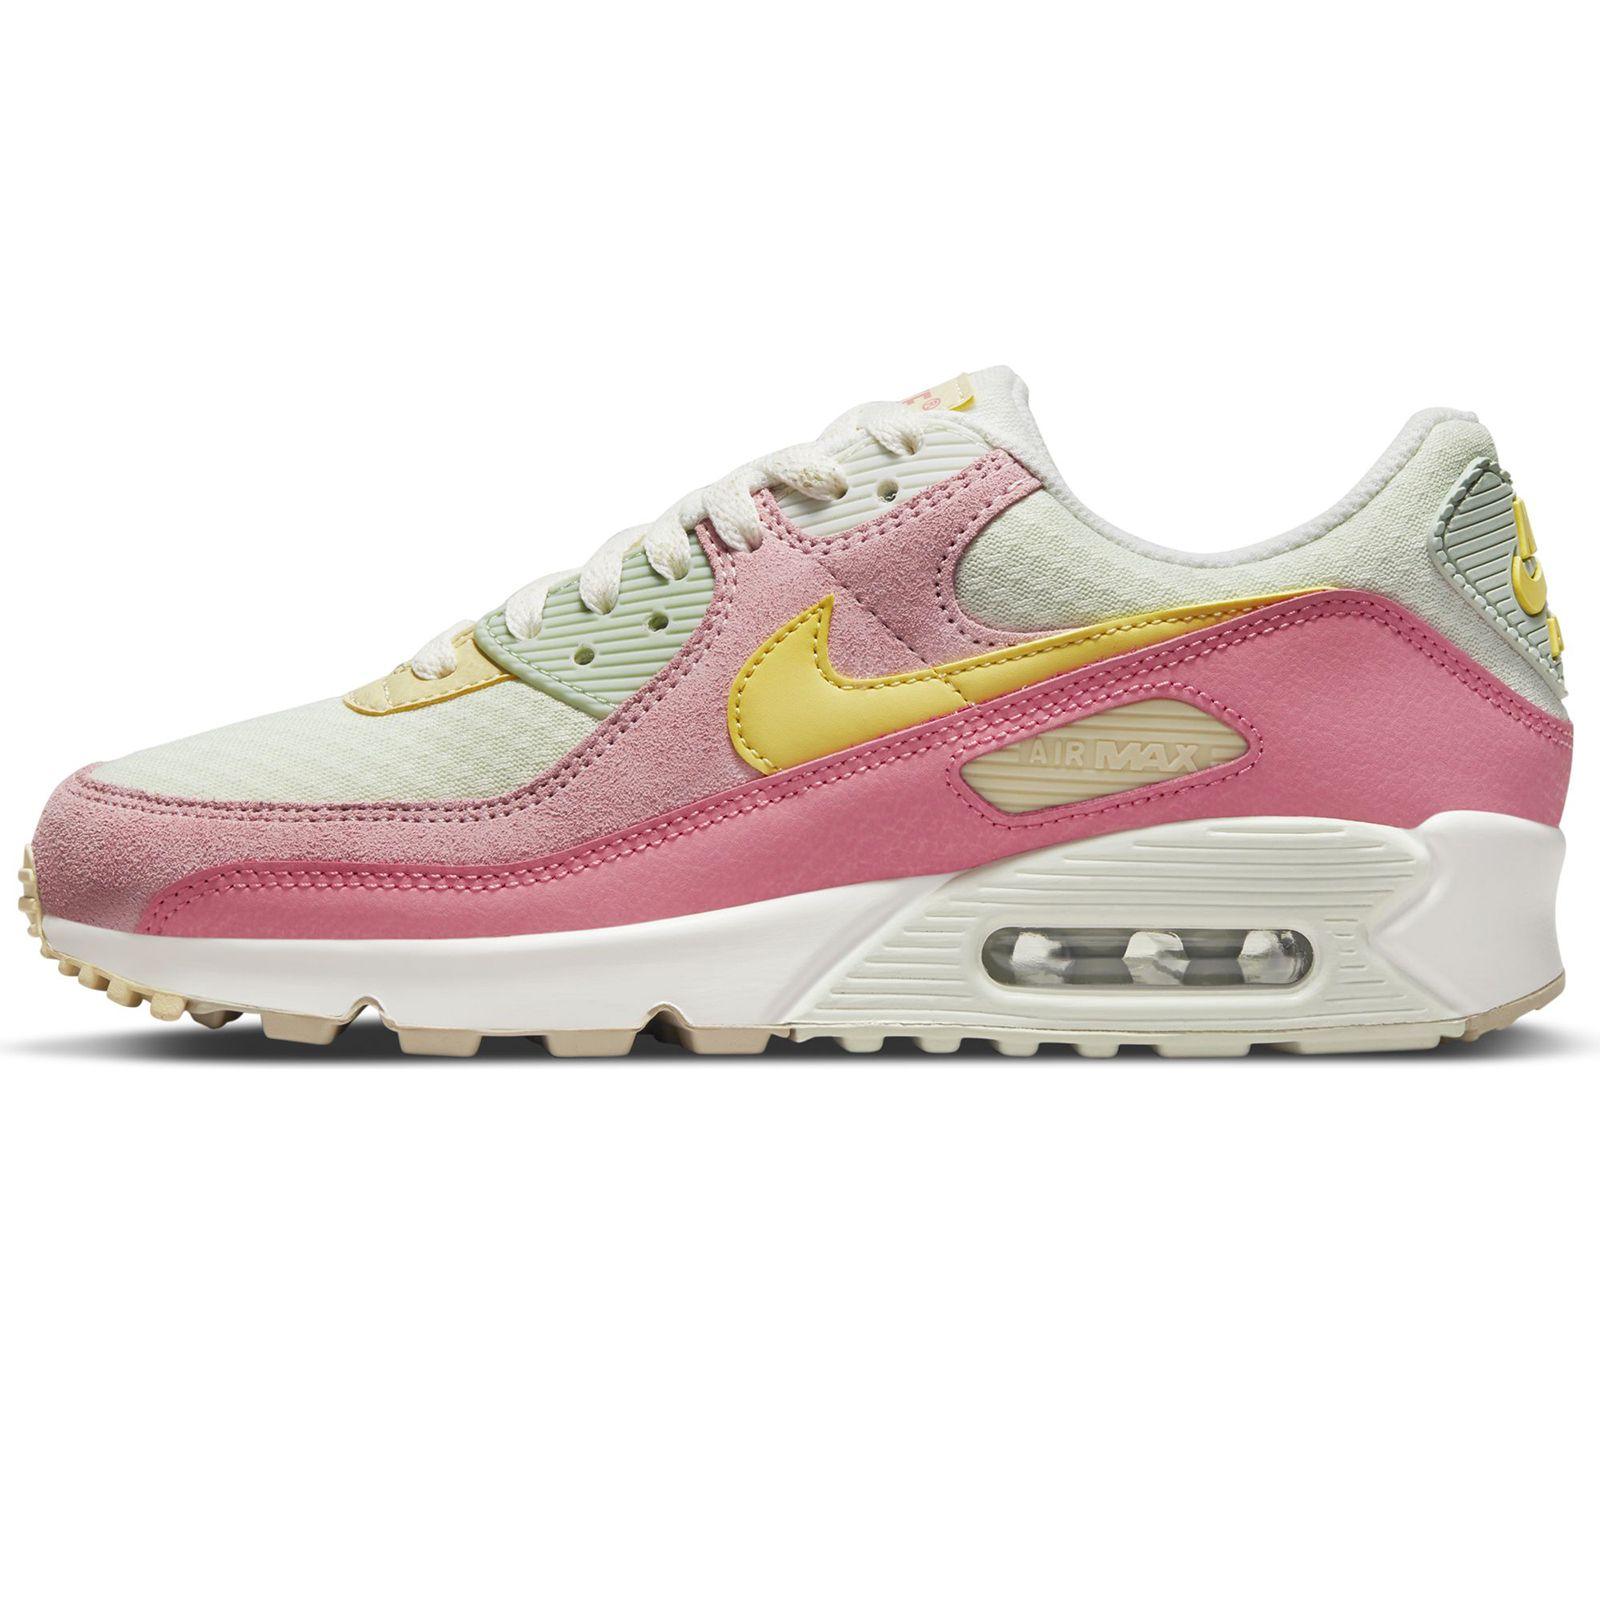 Sneakers76 Online Store